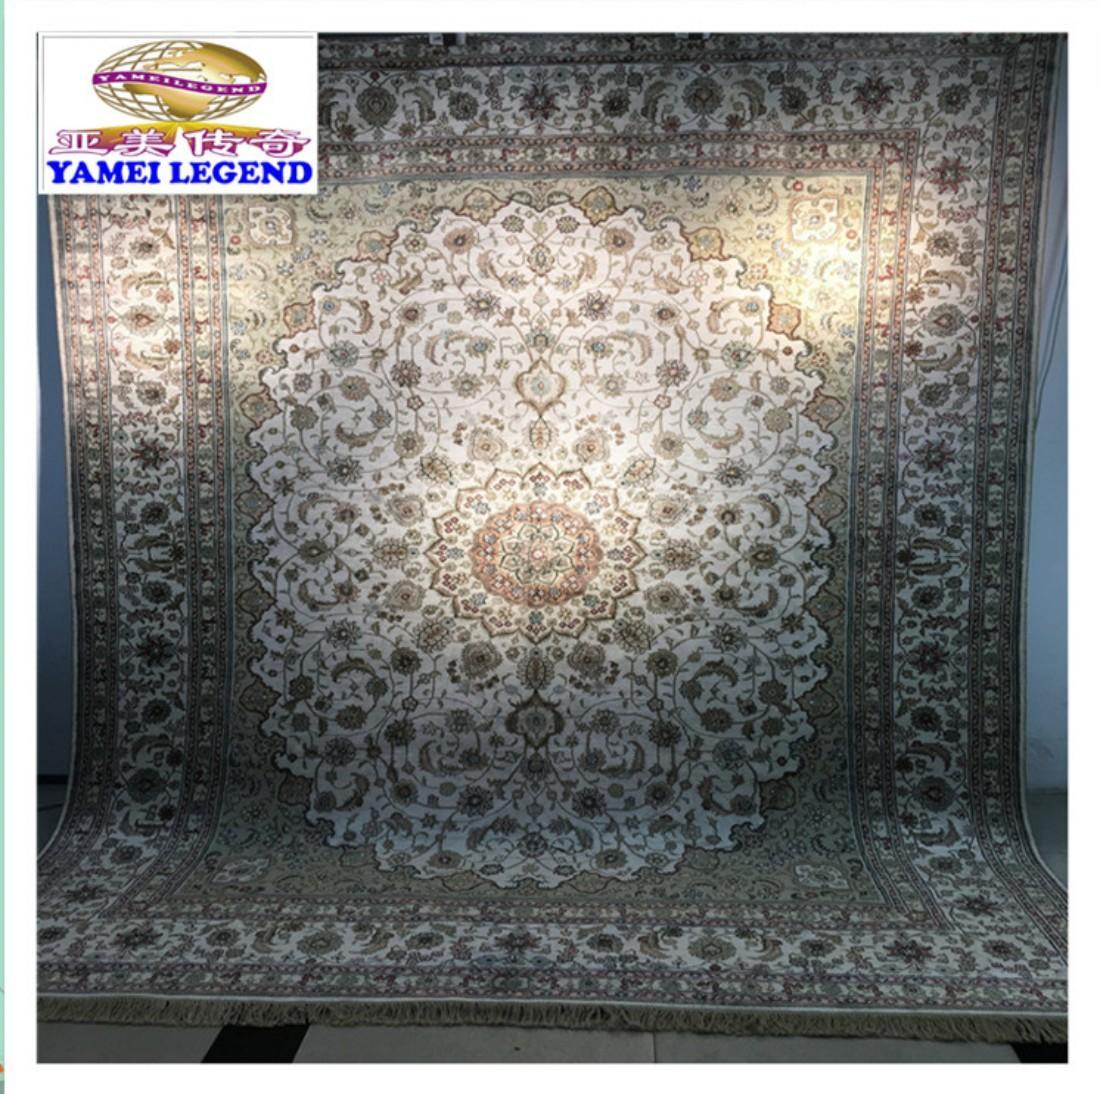 yamei legend discound Silk carpet, Handmade Persian carpet 1